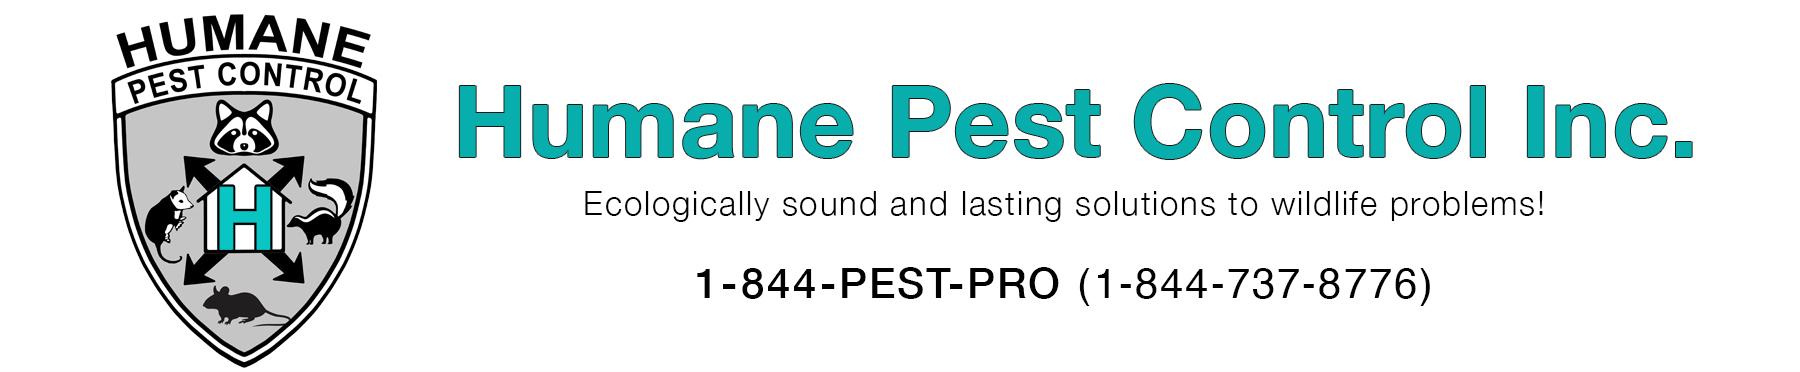 Humane Pest Control Inc